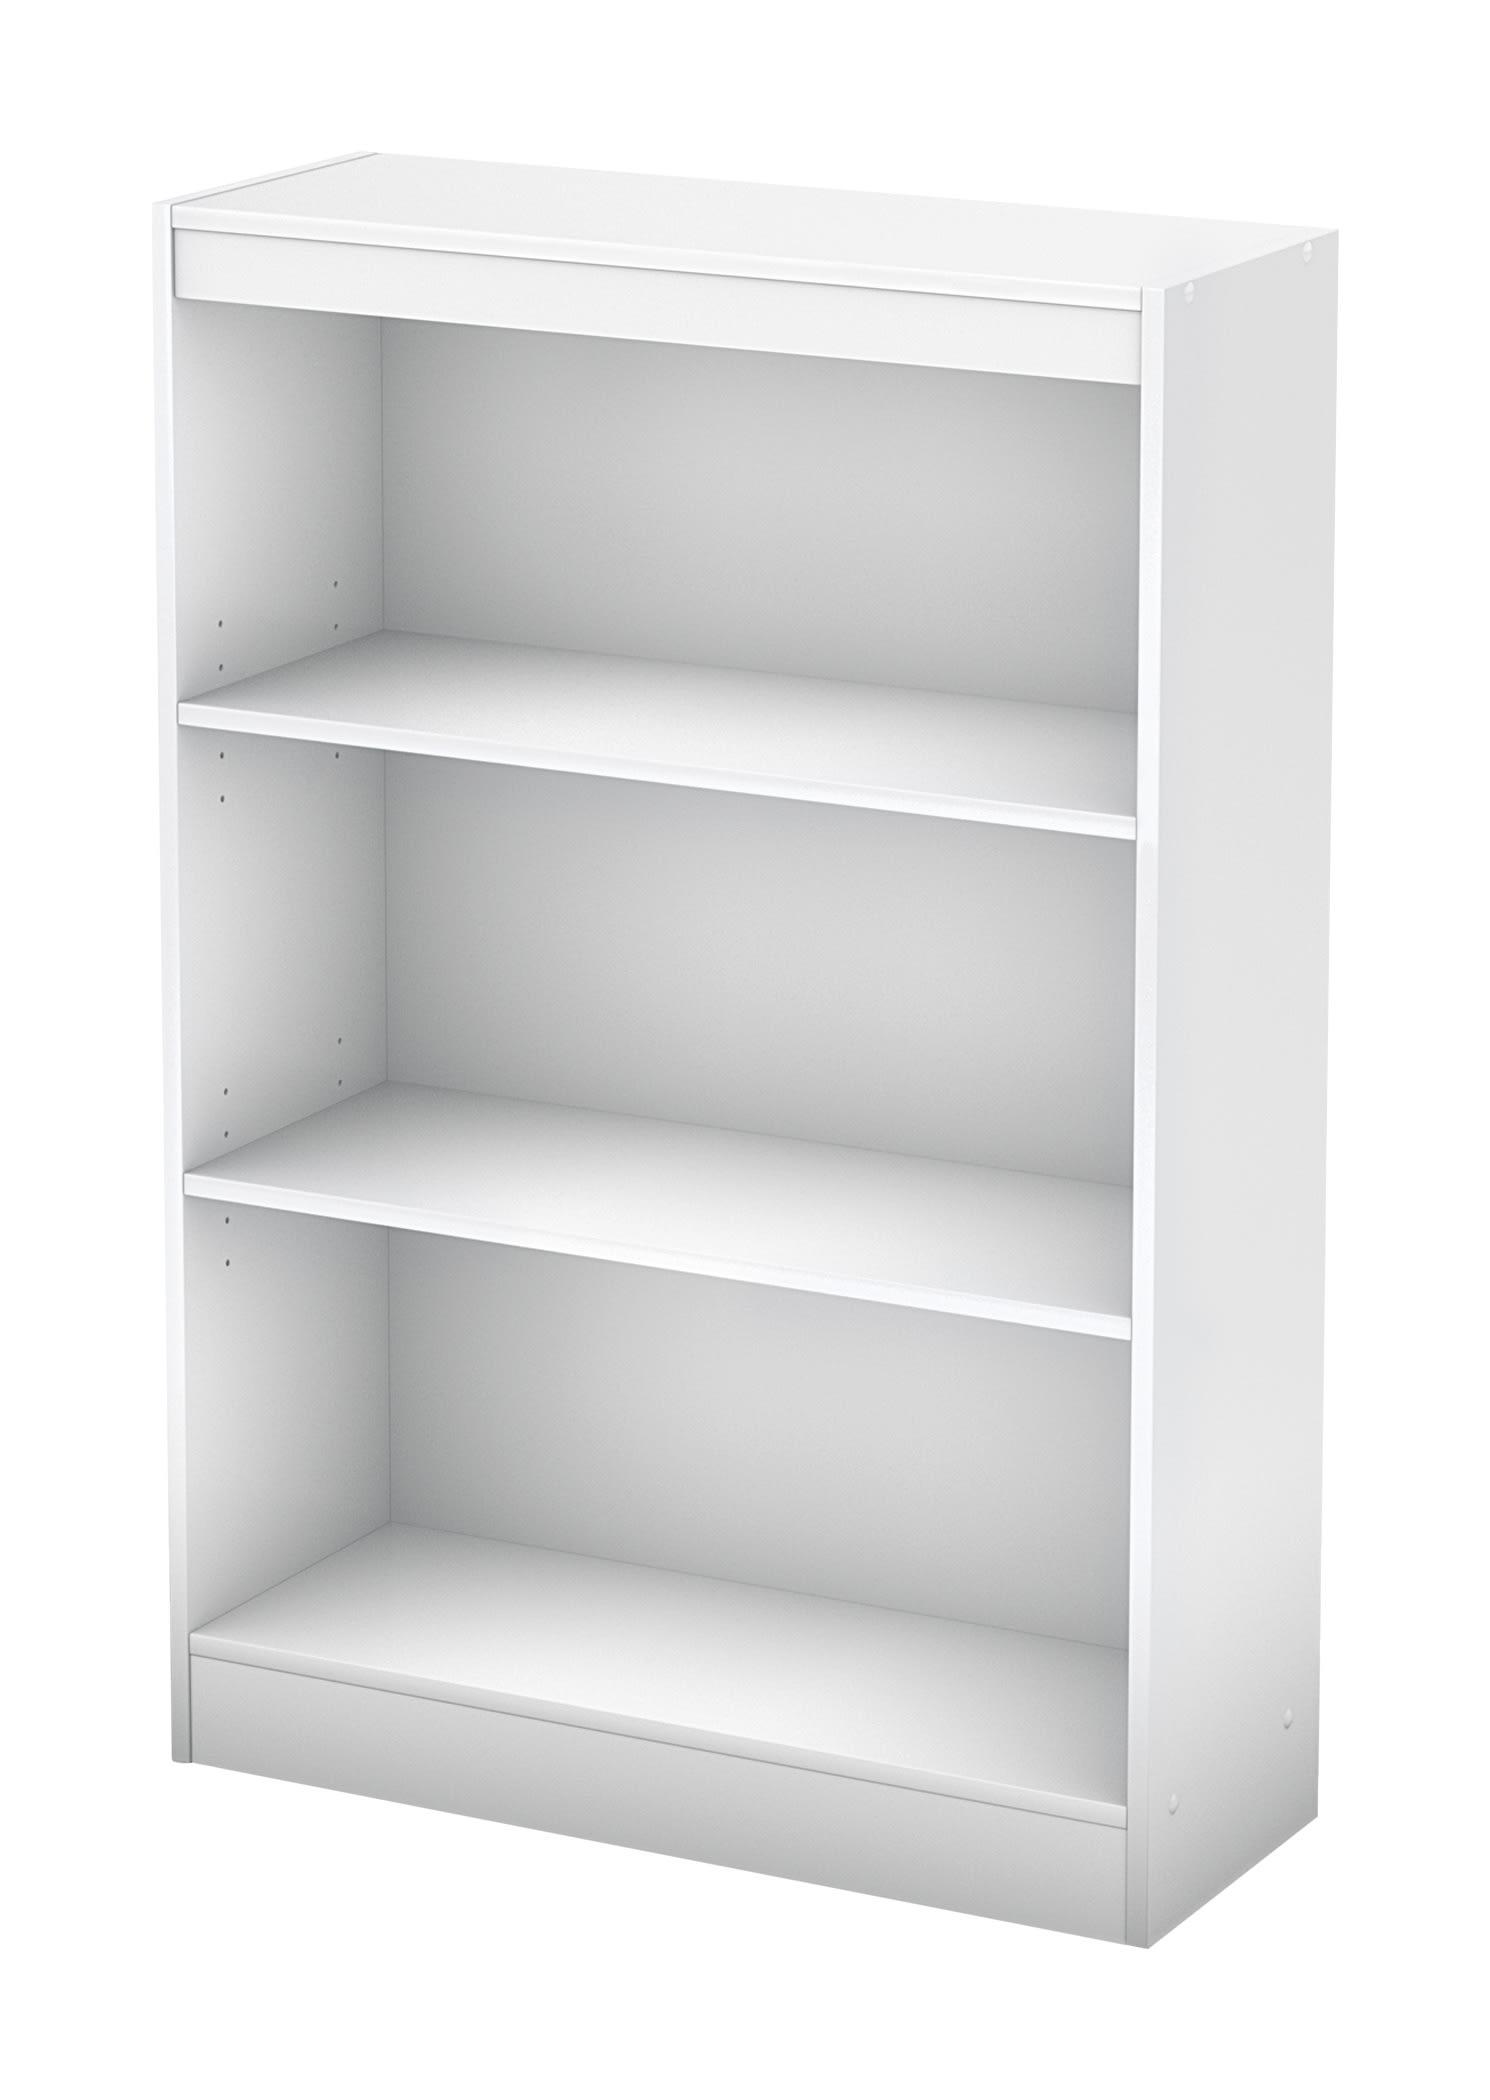 South Shore Axess 3-Shelf Bookcase, Pure White